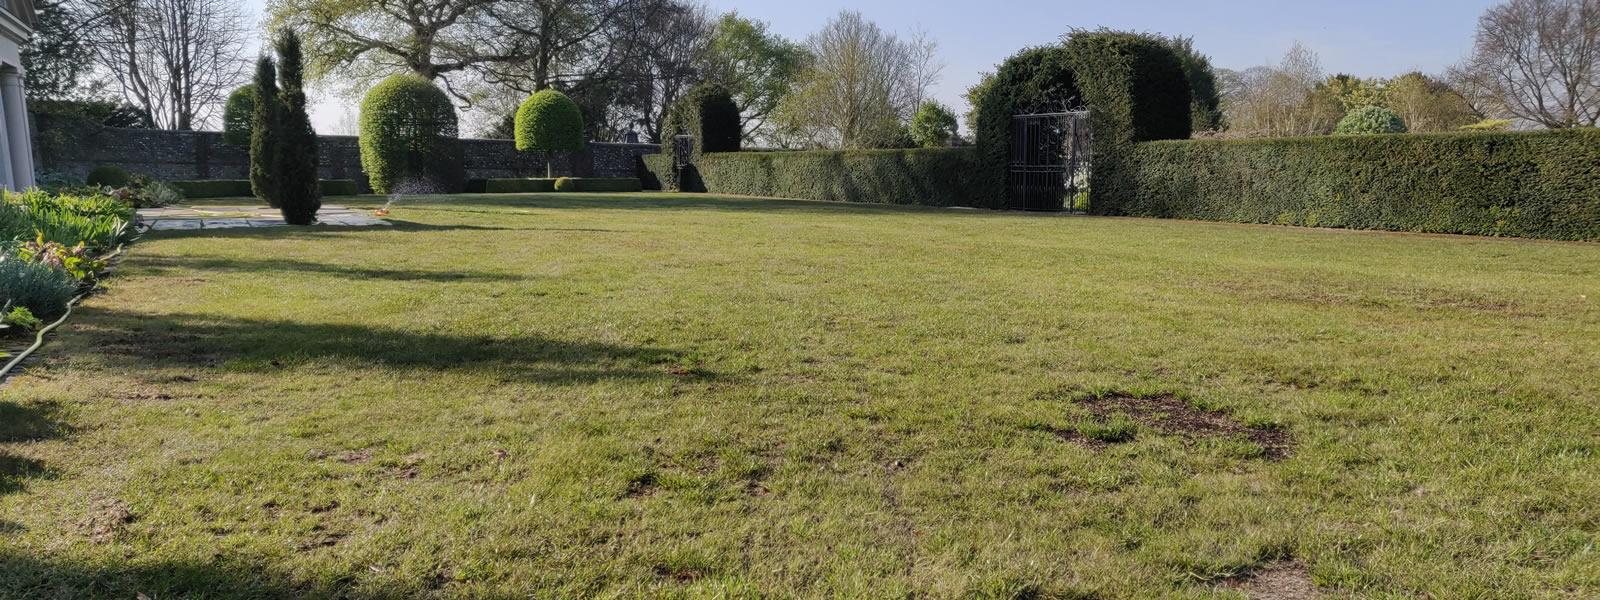 Lawn Thatch Removal